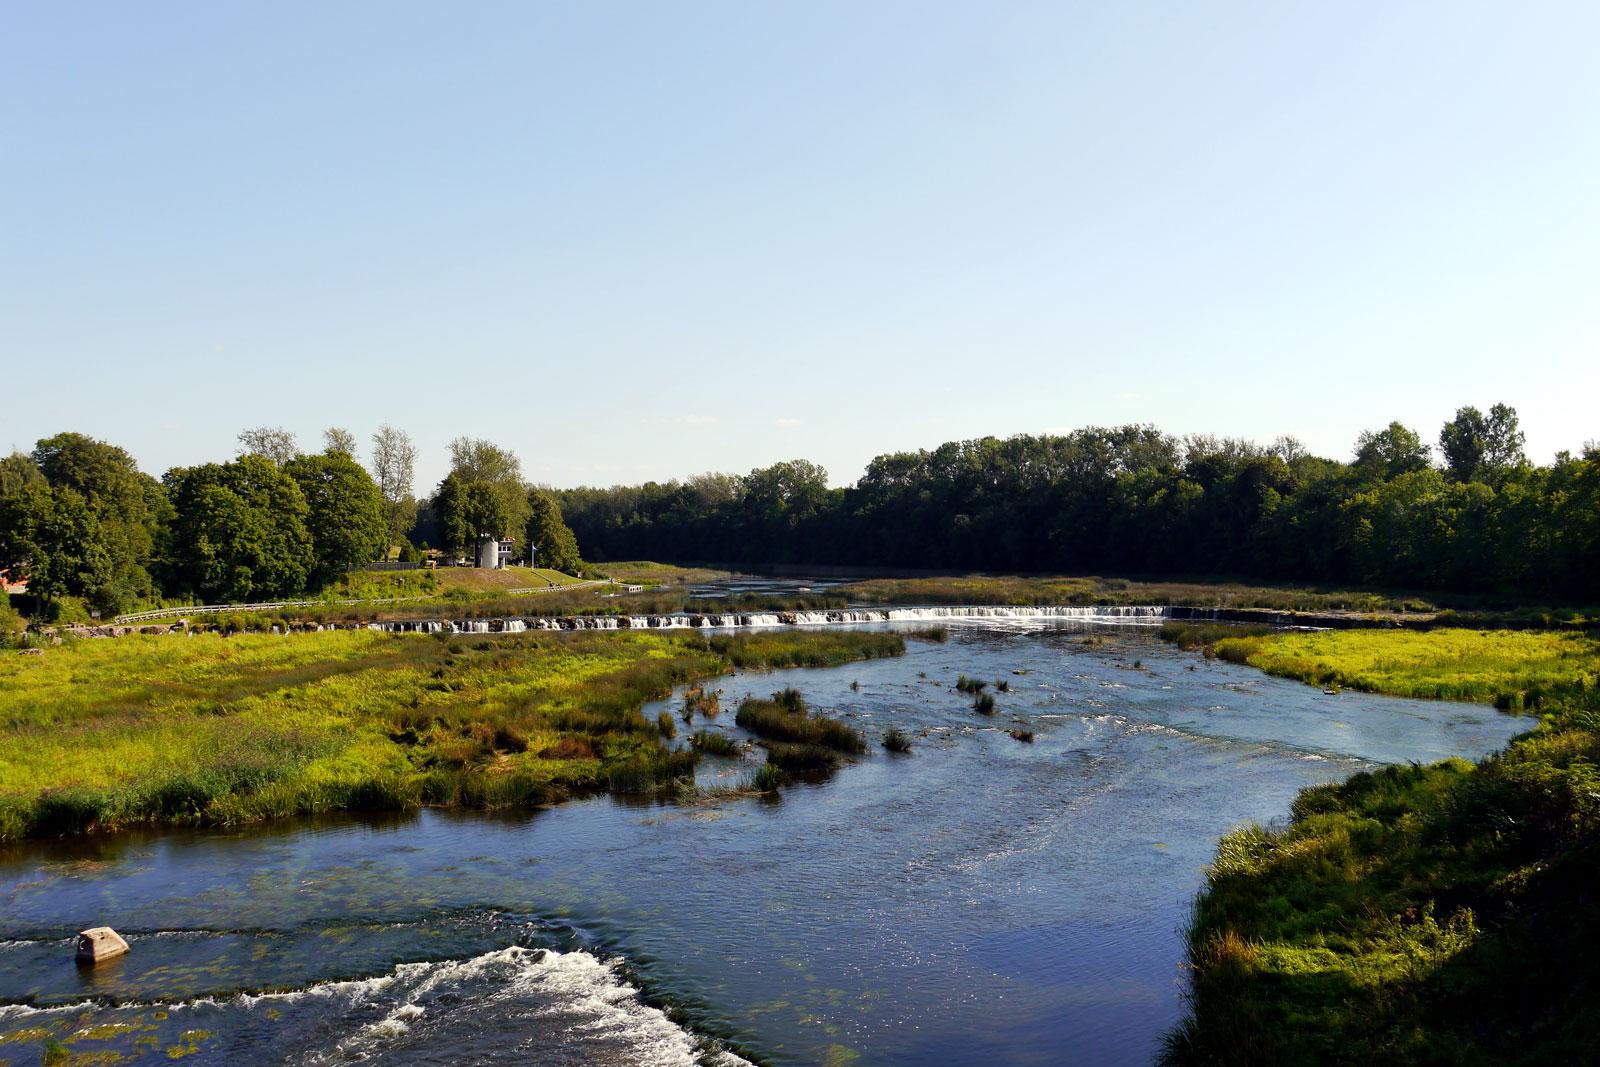 Ventas rumba Wasserfall in Kuldiga, Lettland.